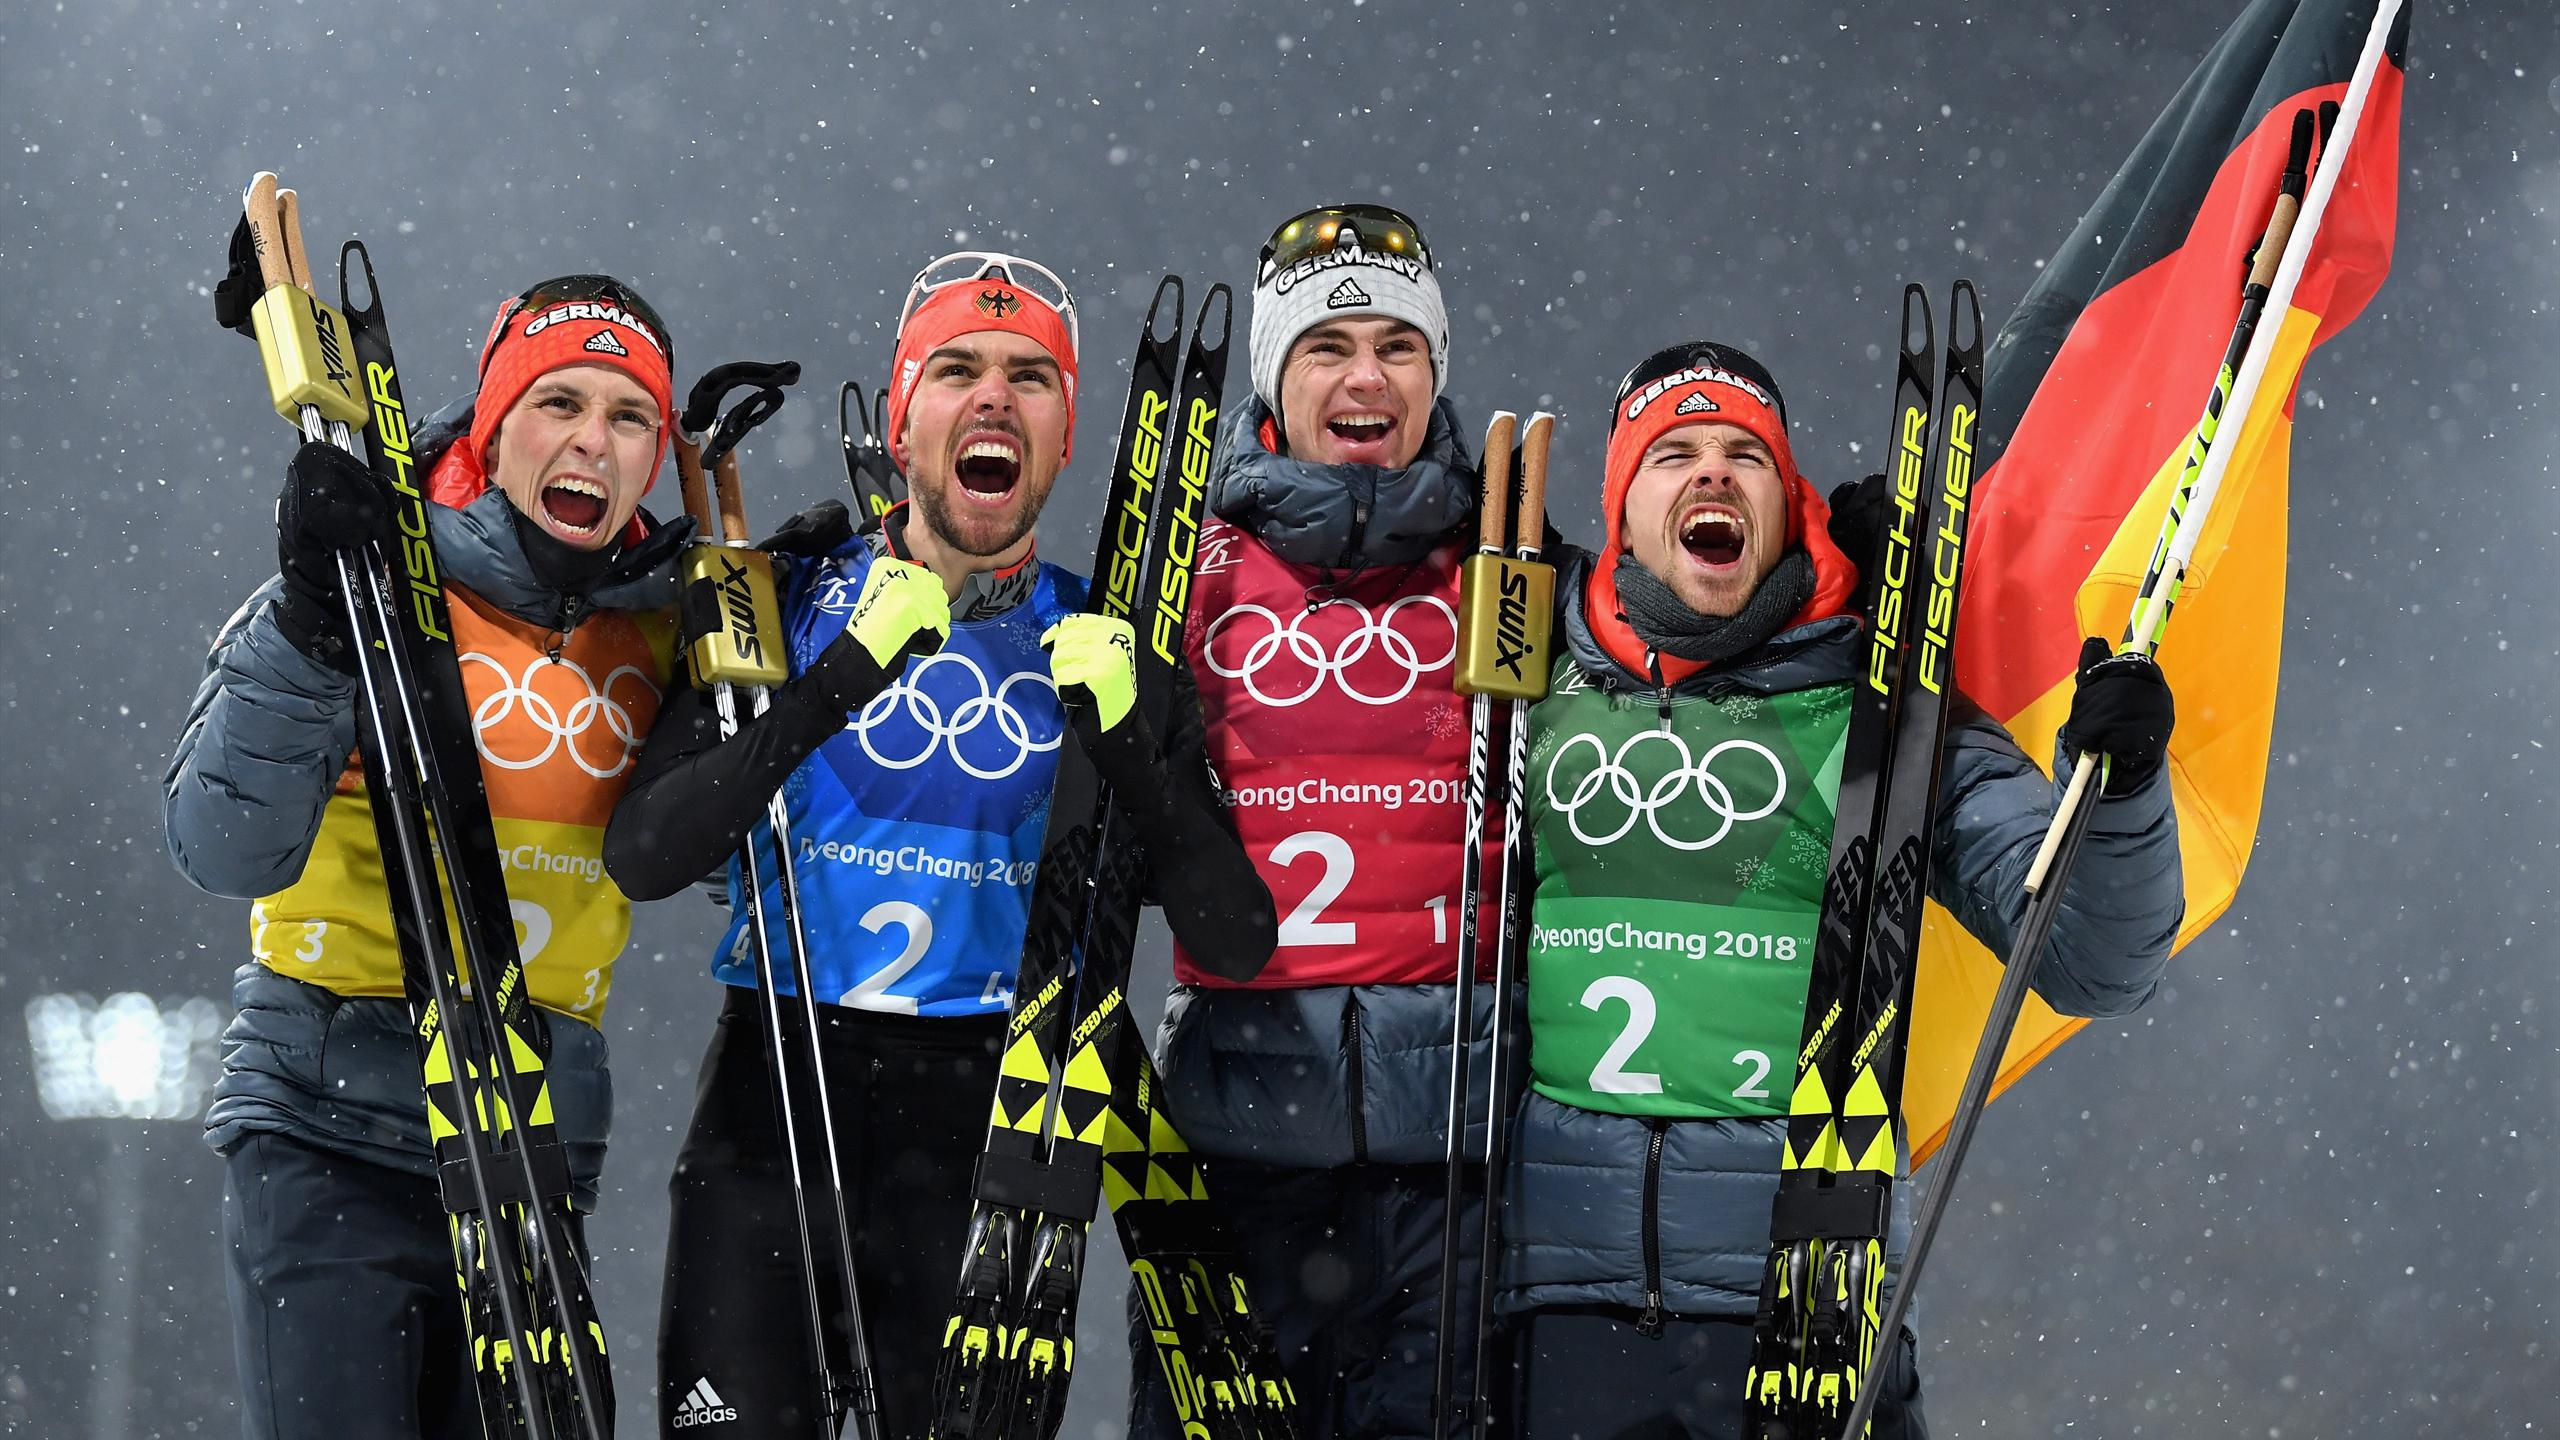 Jacke olympia 2018 germany